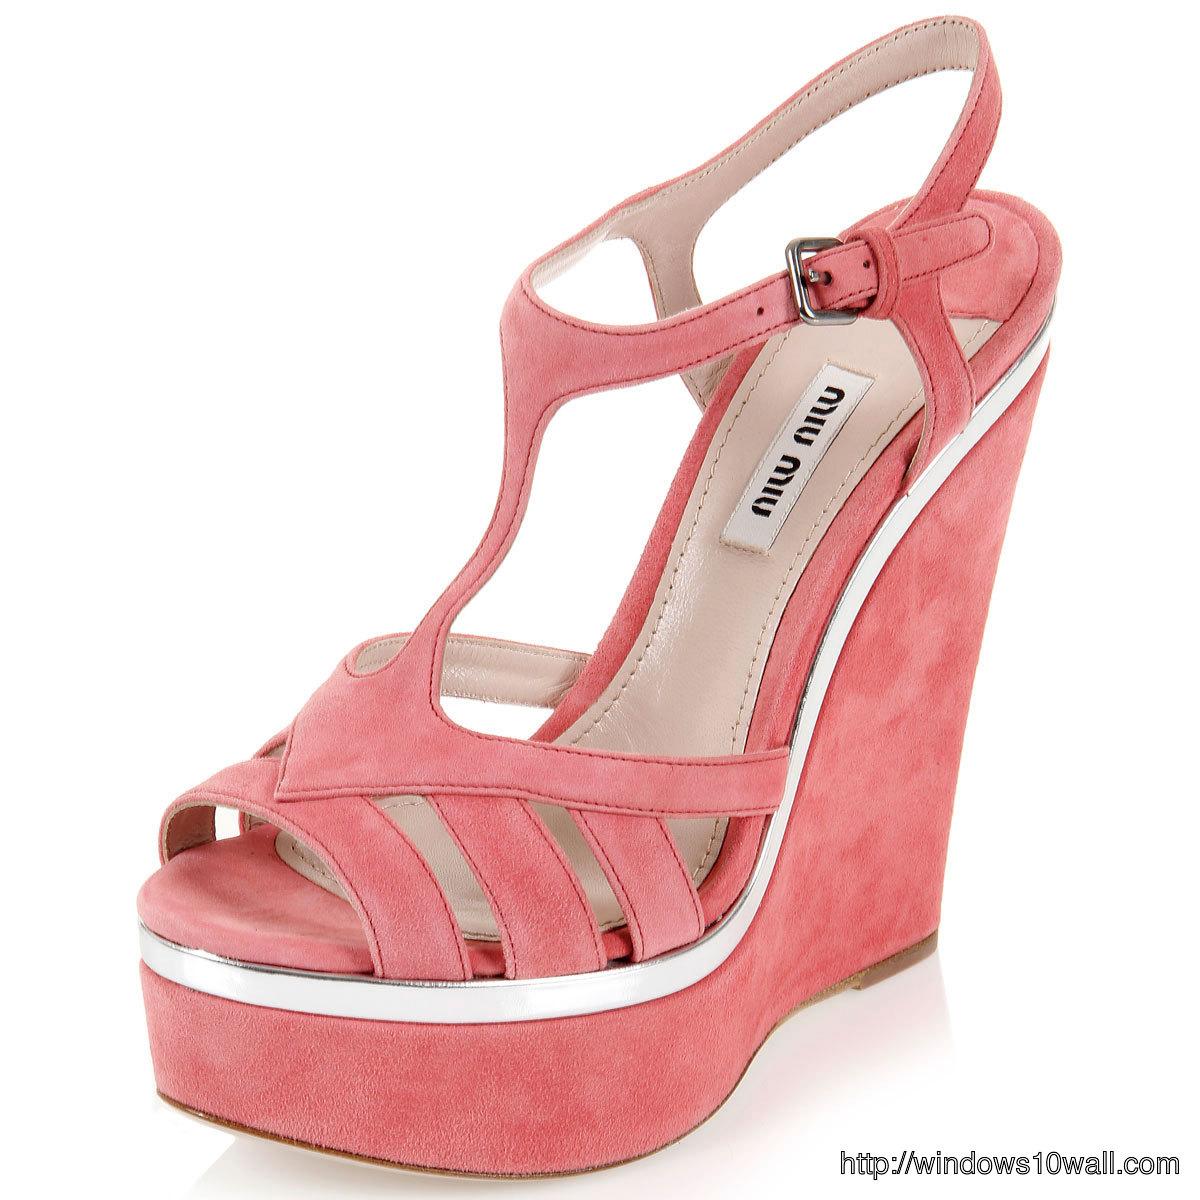 Pink-Miu-Miu-Suede-Wedge-Sandals-background-wallpaper